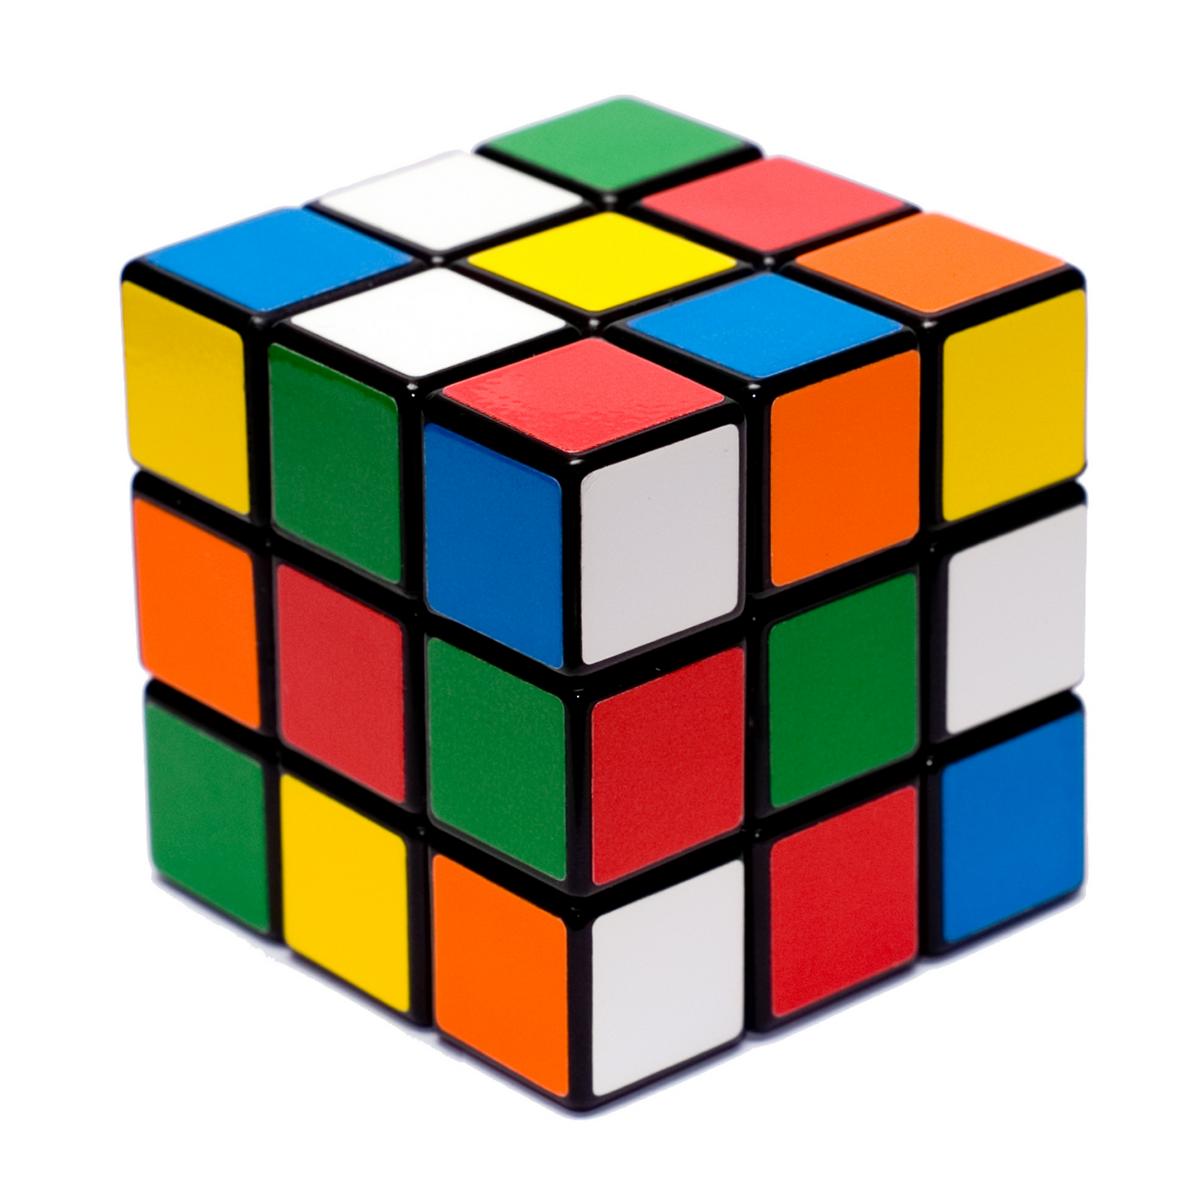 Jules, jules homme, rubik's cube, t shirt, tee-shirt, mode homme, mode masculine, du dessin aux podiums, dudessinauxpodiums, cube, cubo mágico, t shirt design, cubo rubik, puzle, erno rubik, fashion men, rubiks, resolver cubo rubik, puzzl